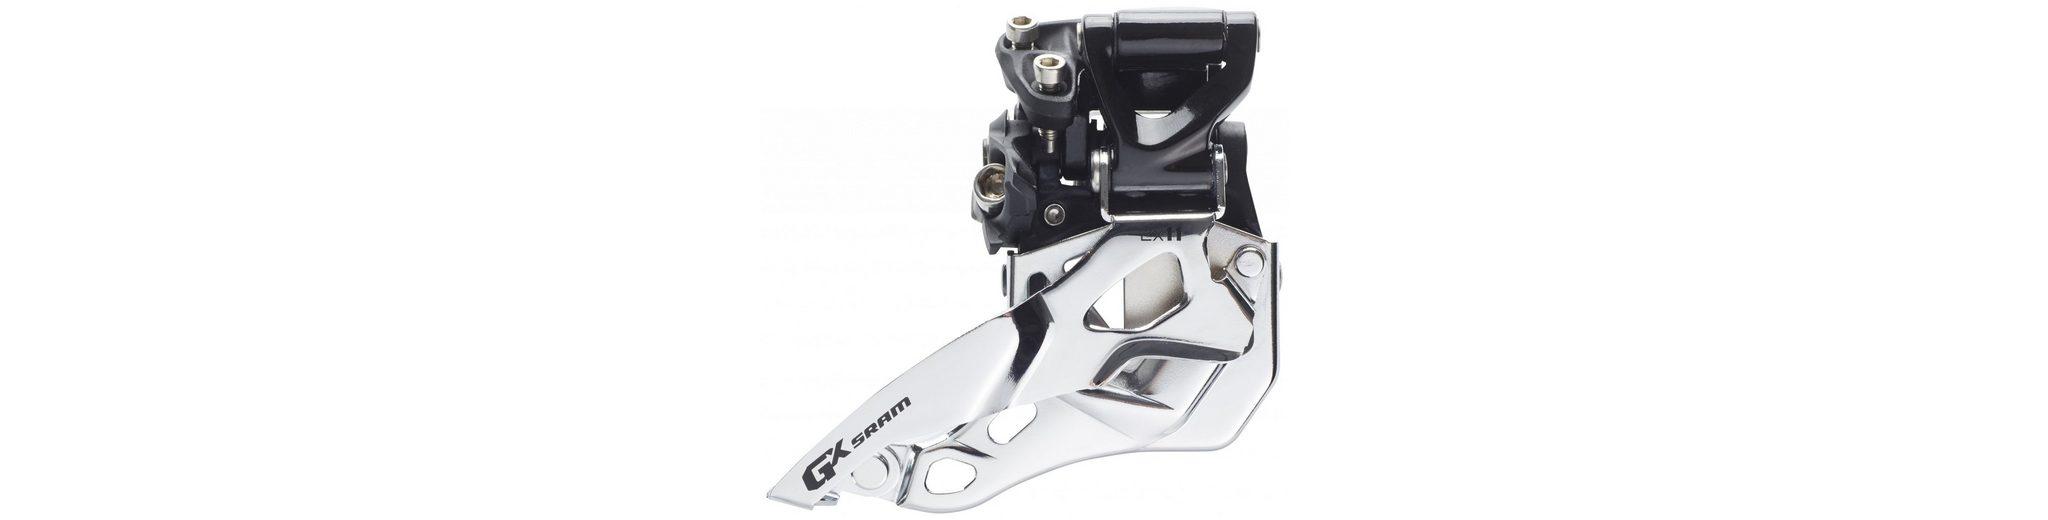 SRAM Schaltung »GX Umwerfer 2x11-fach Mid Direct Mount Top Pull«